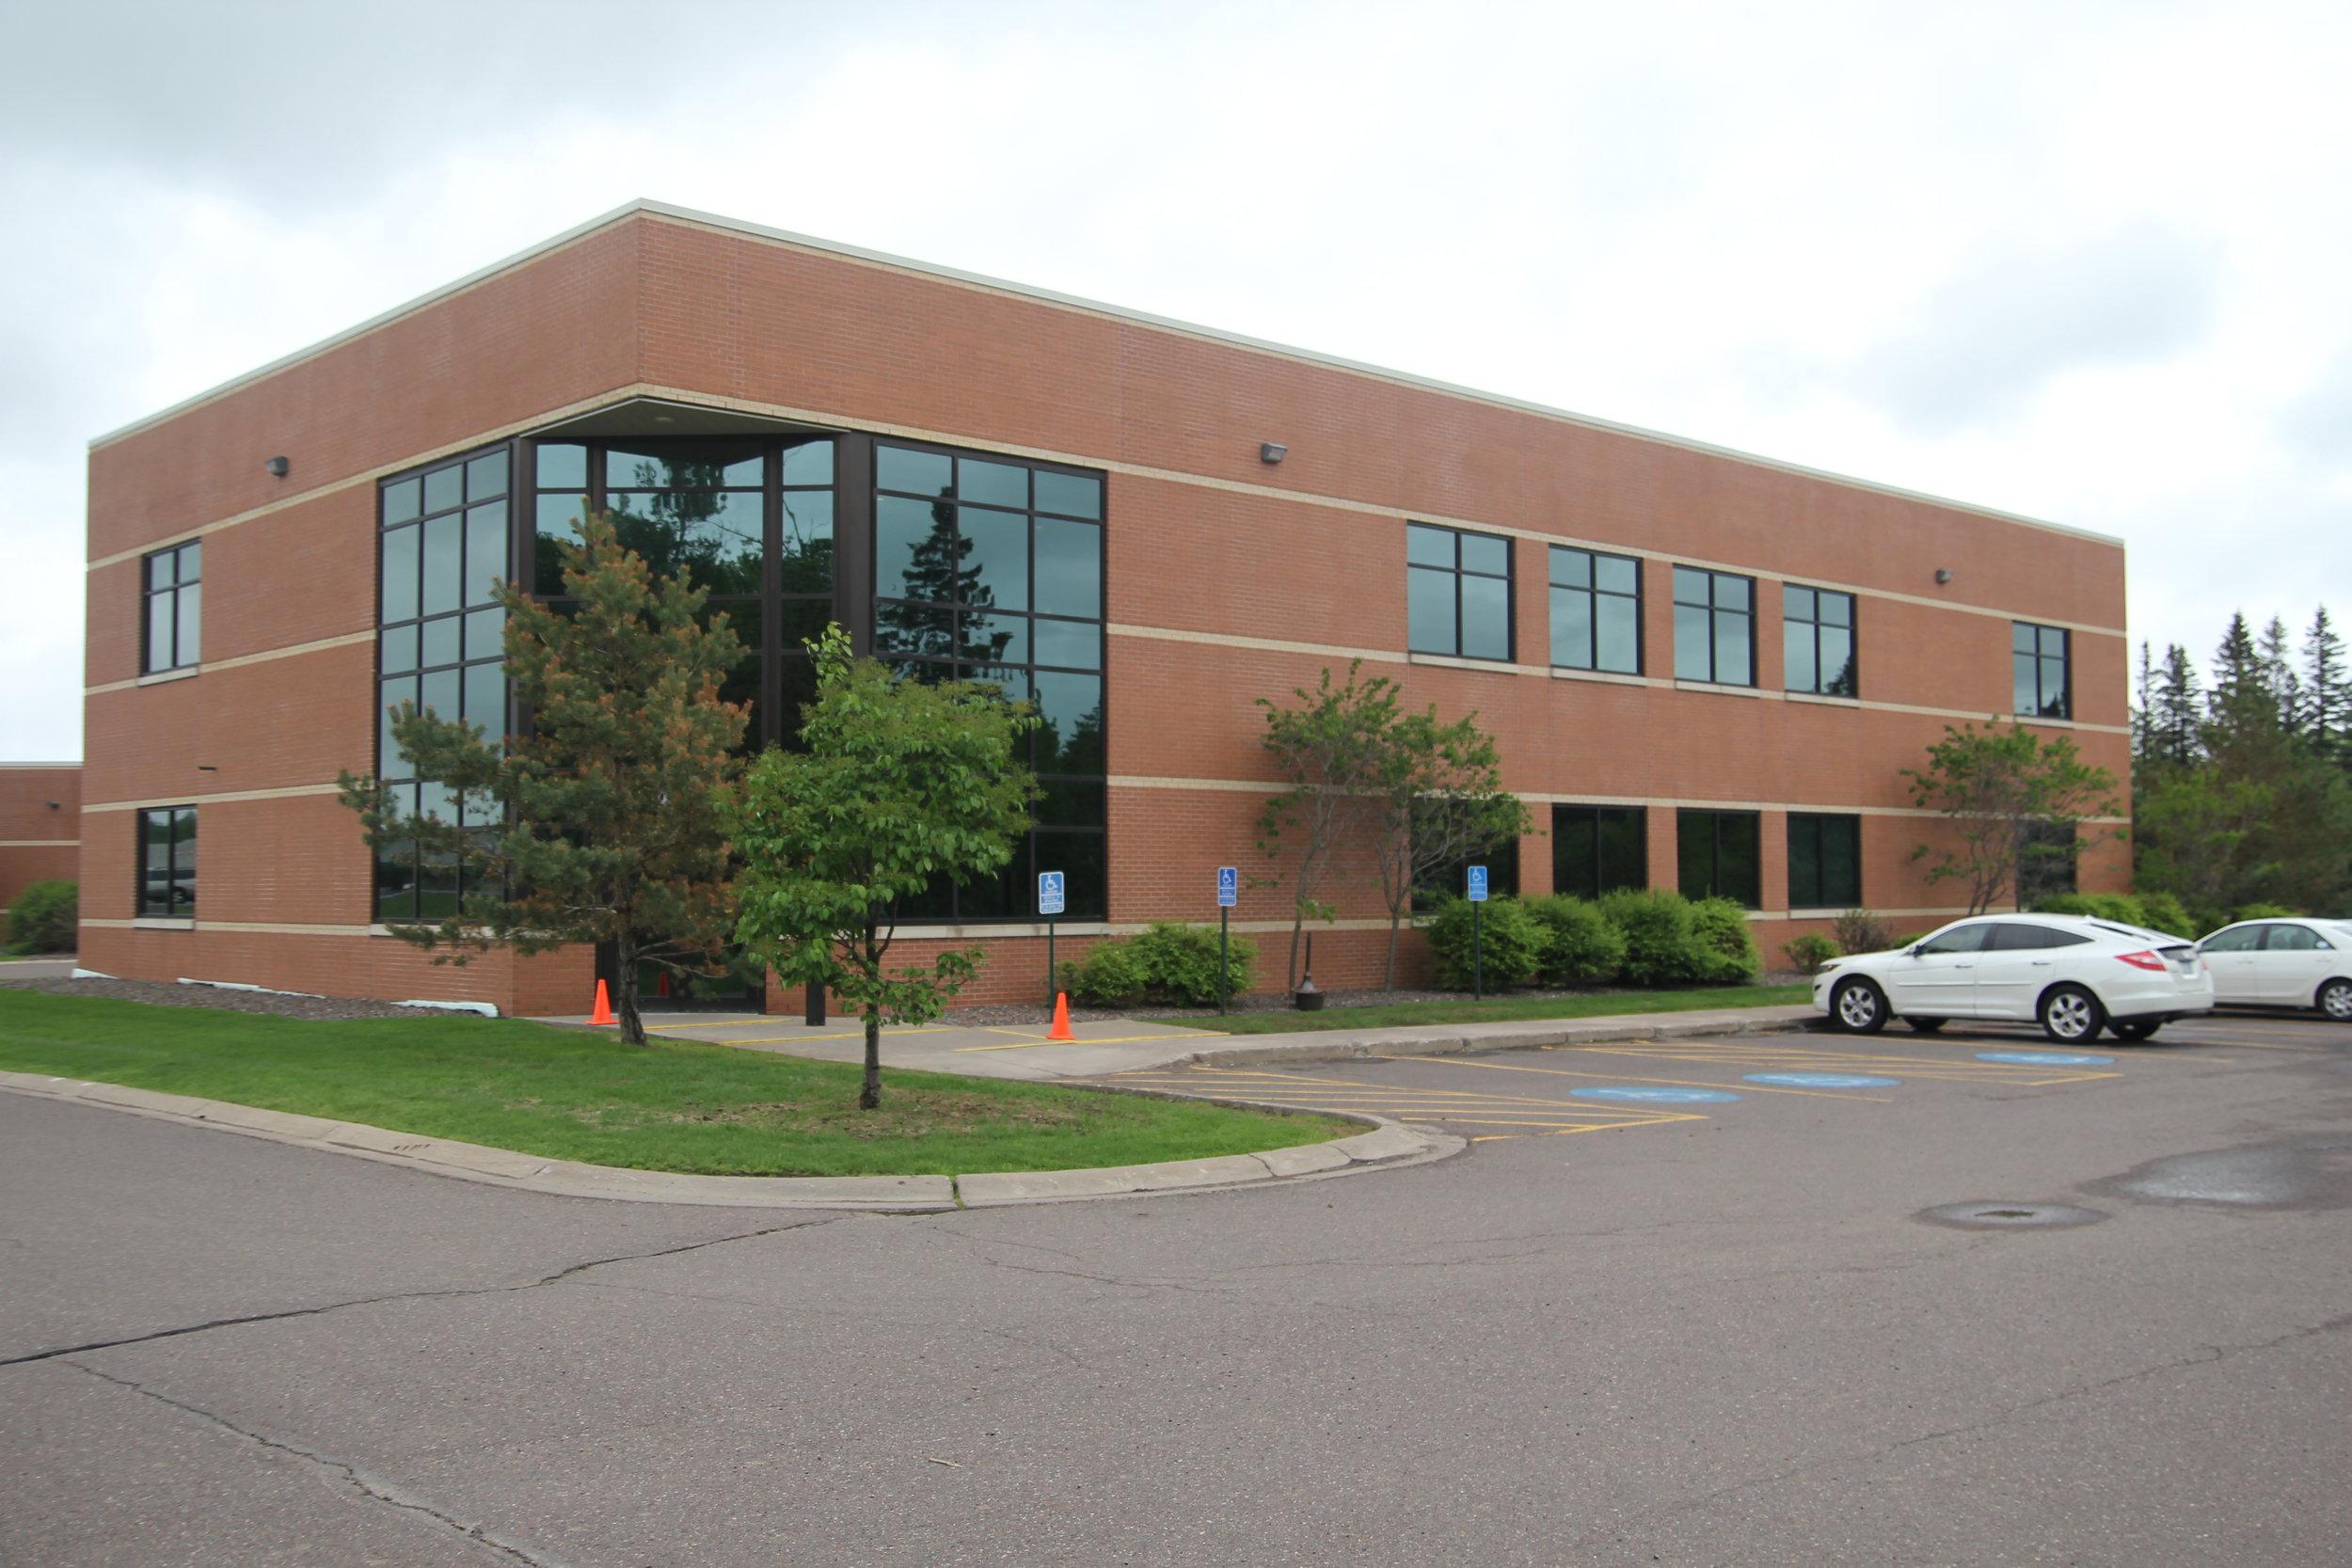 Hermantown Clinic - 4815 West Arrowhead RoadSuite #110Hermantown, MN 55811